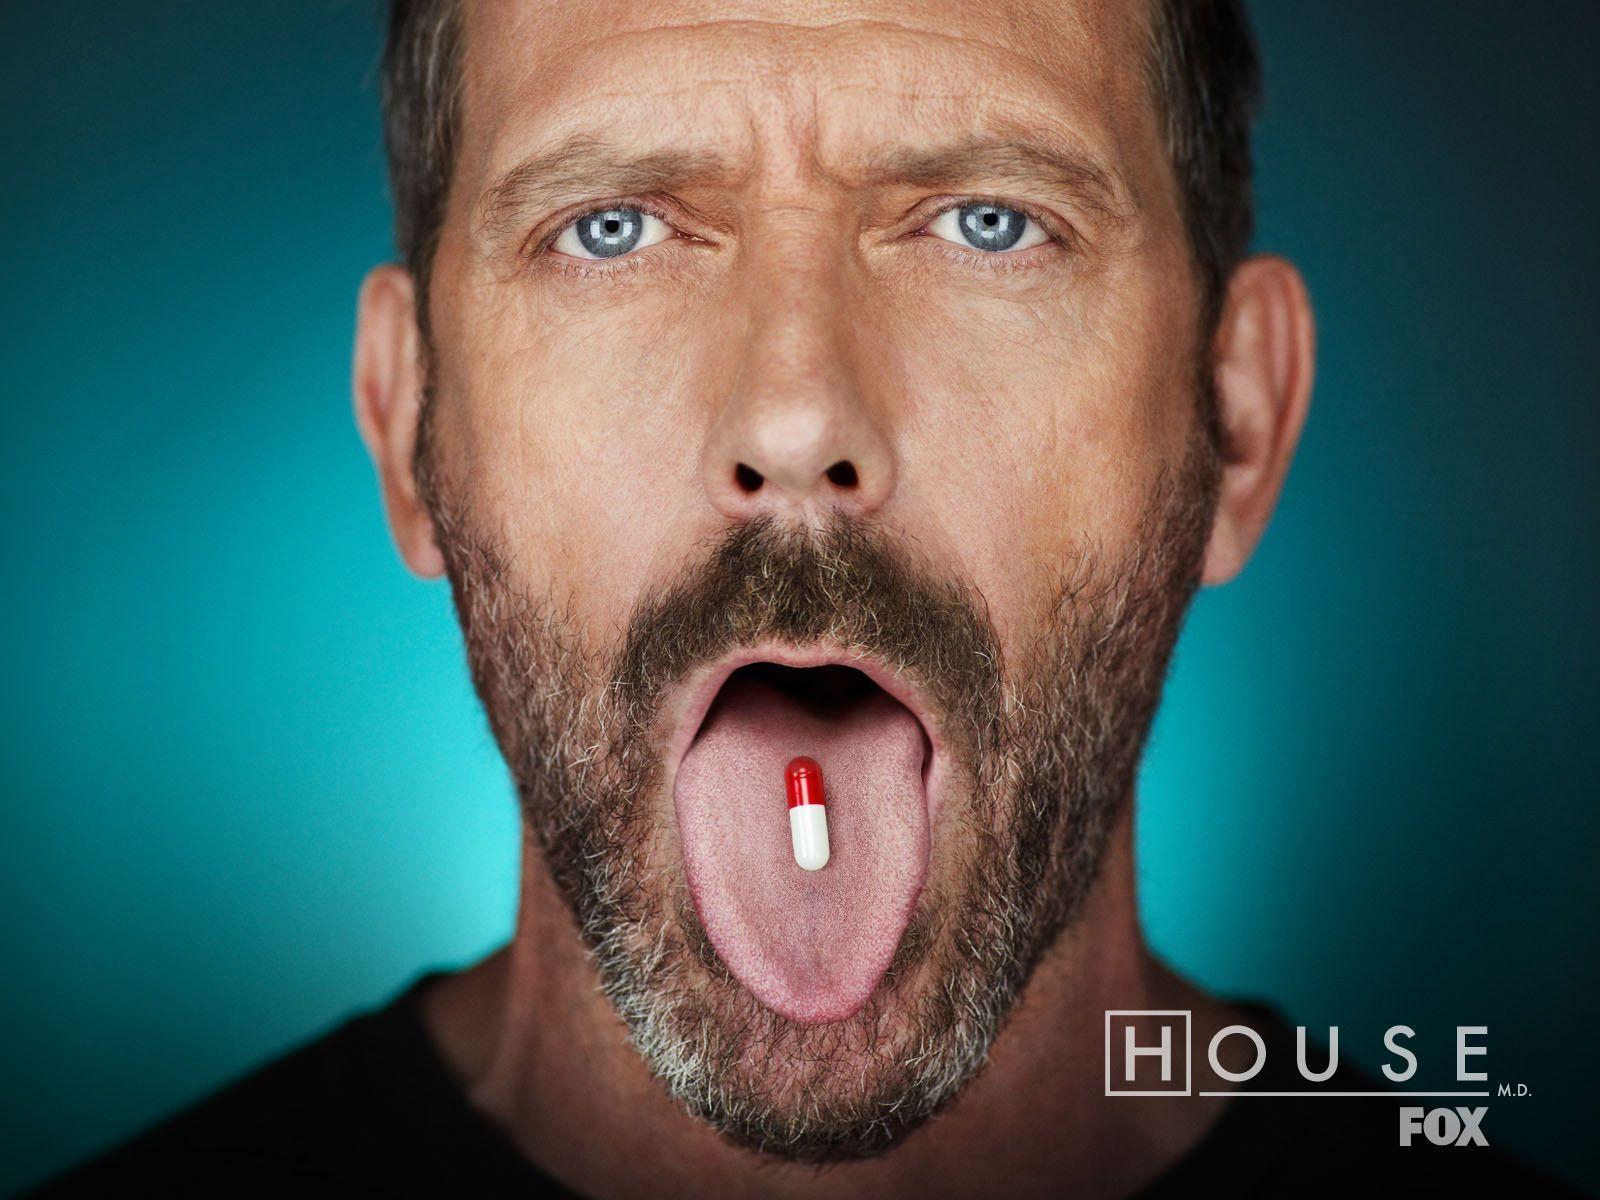 best Dr House MD images on Pinterest